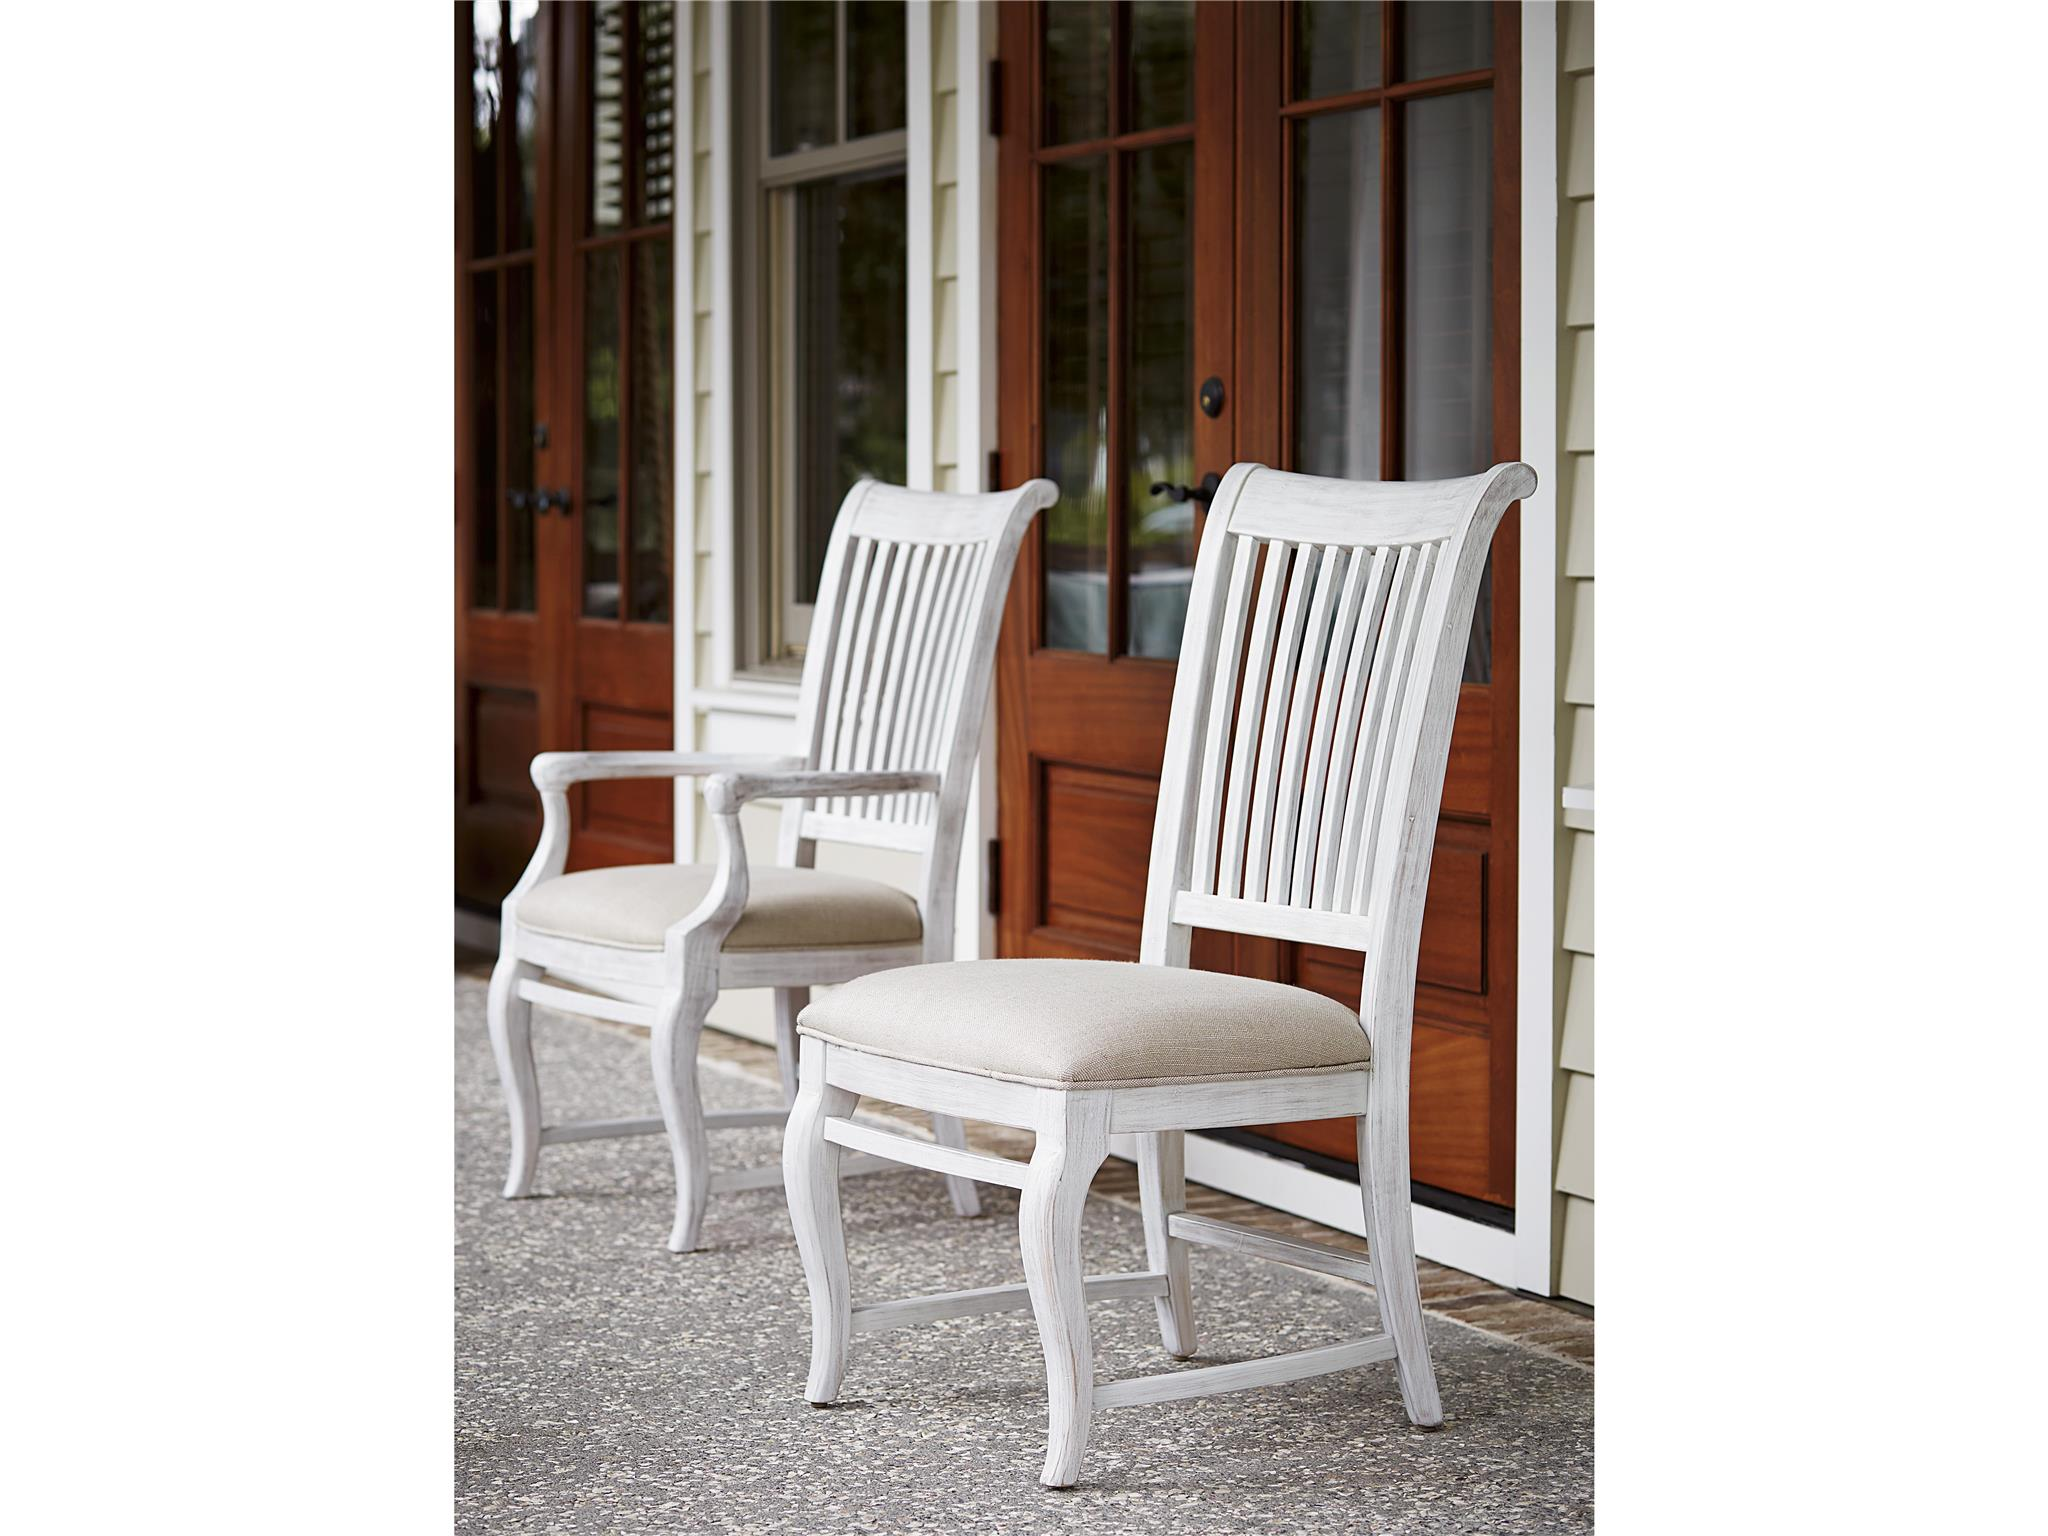 paula deen dogwood dining chairs for restaurants universal furniture home